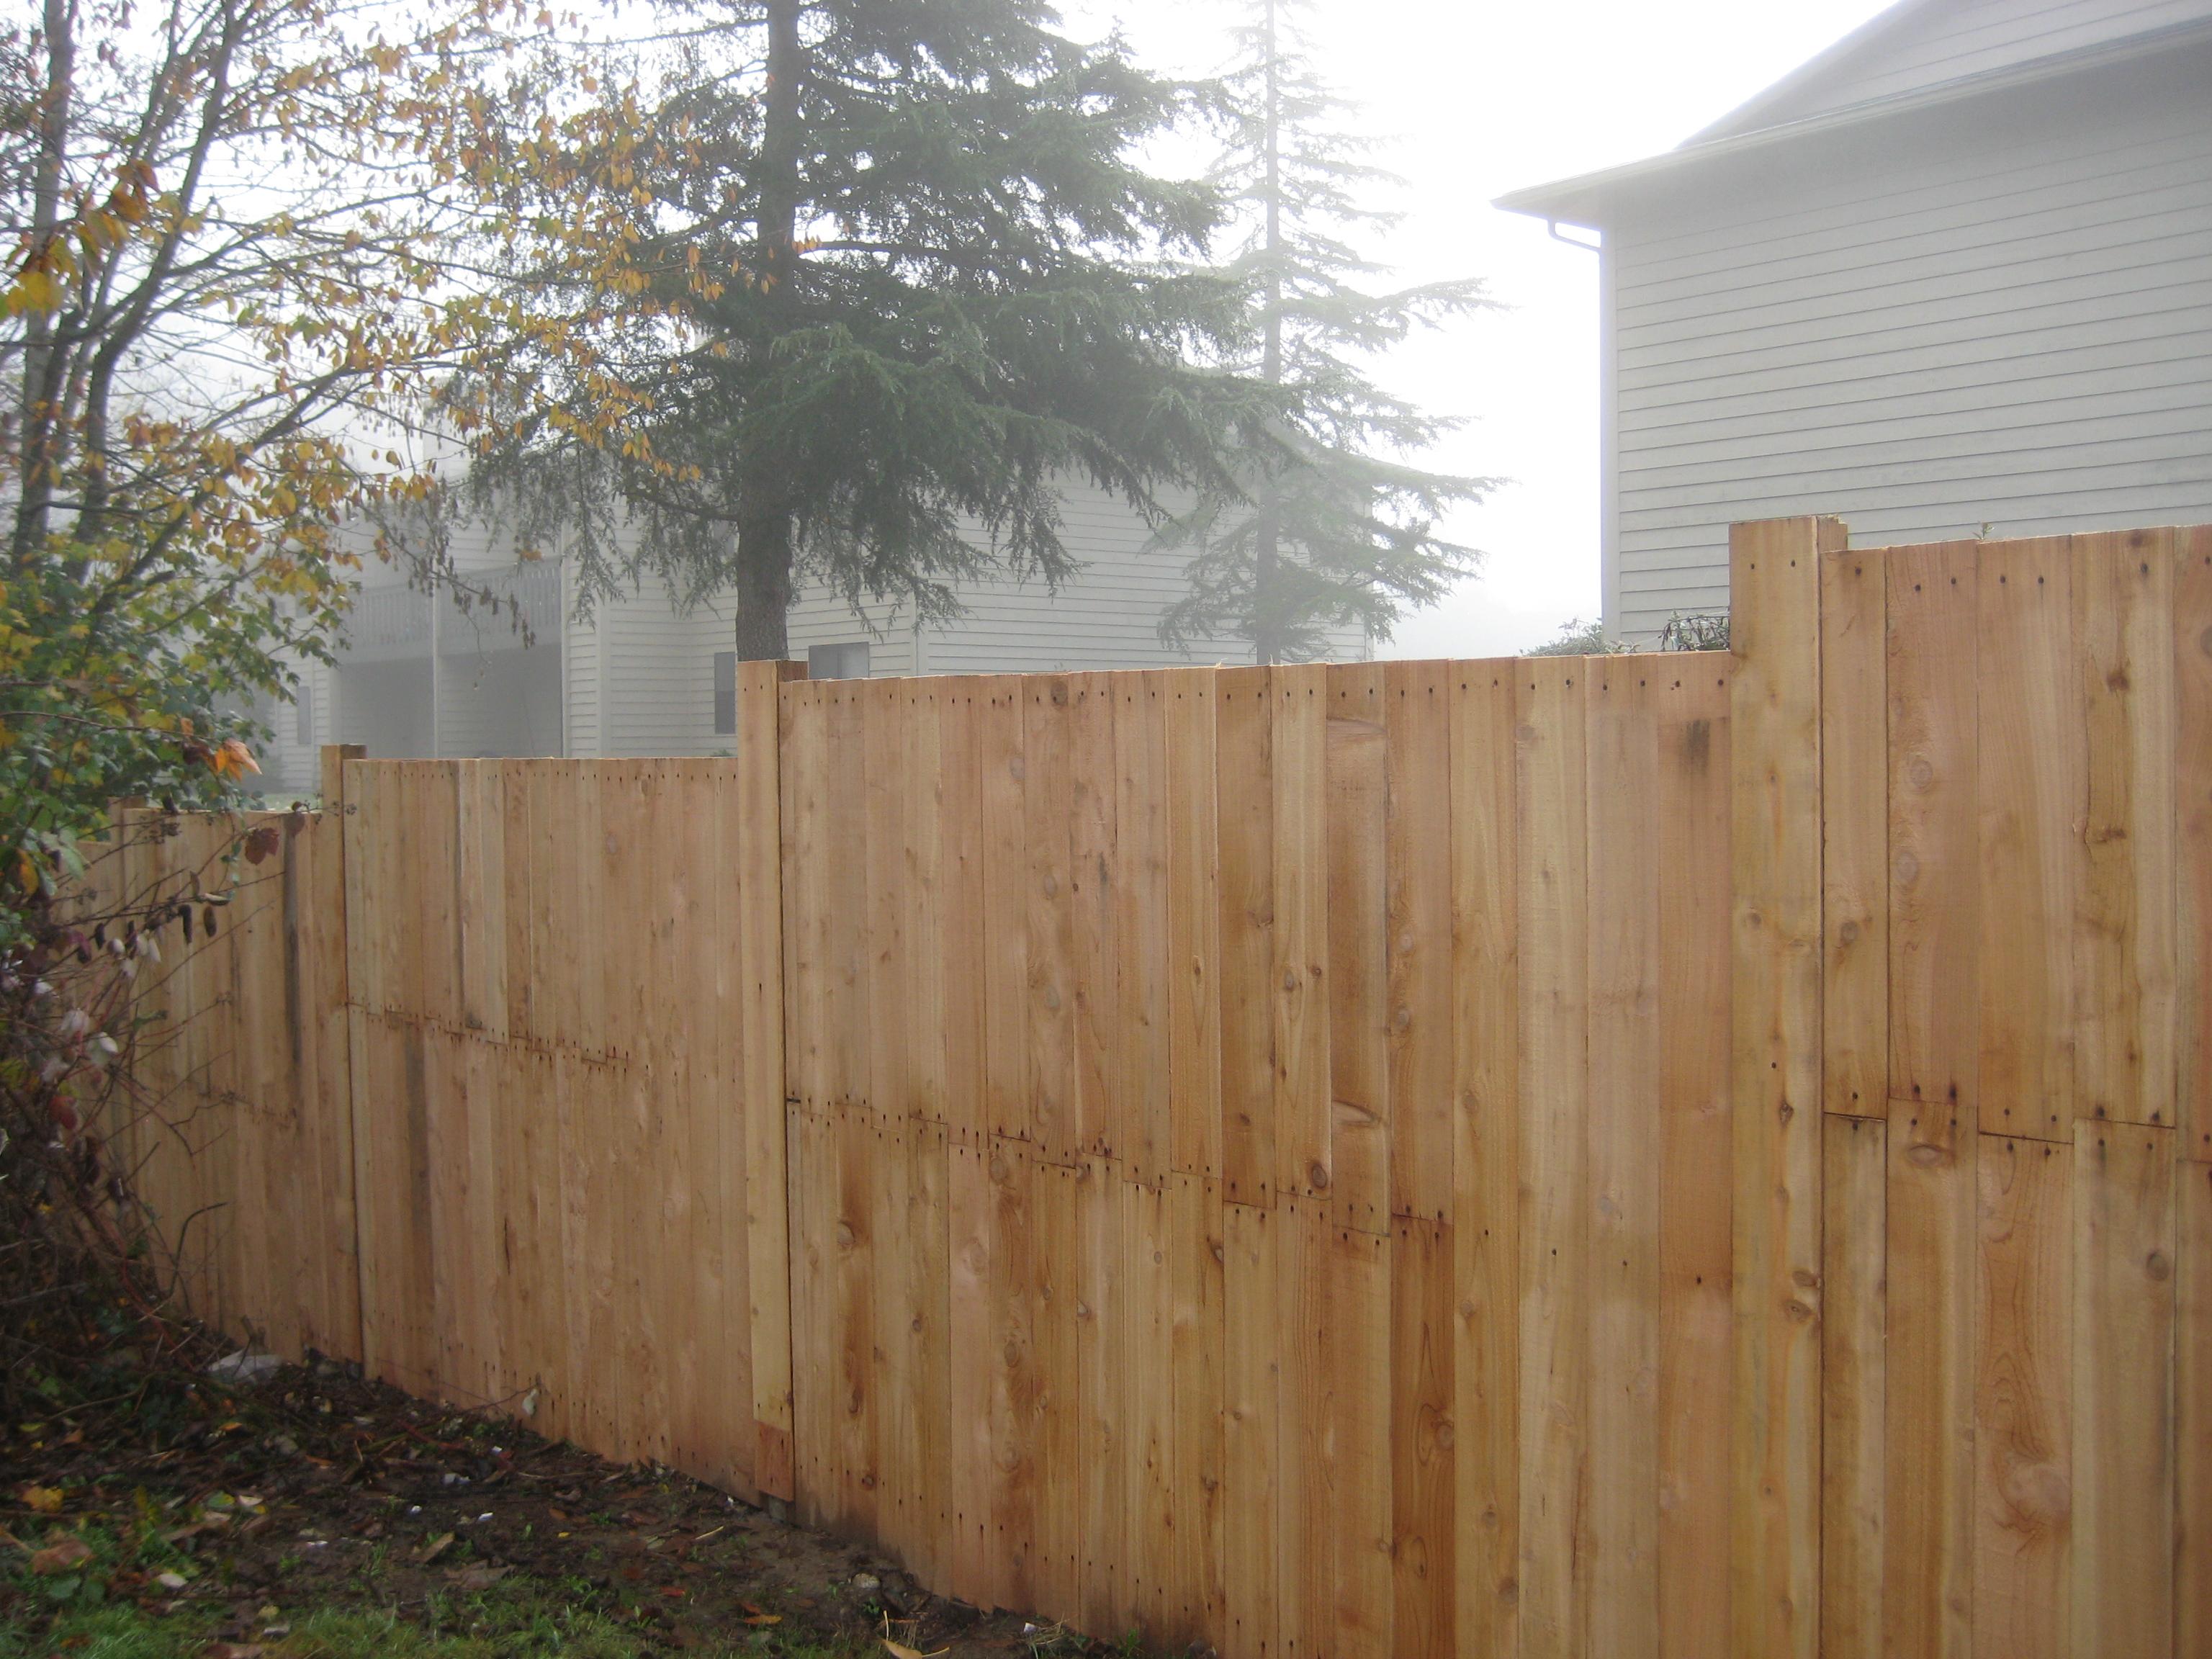 University Place fence 1(c)